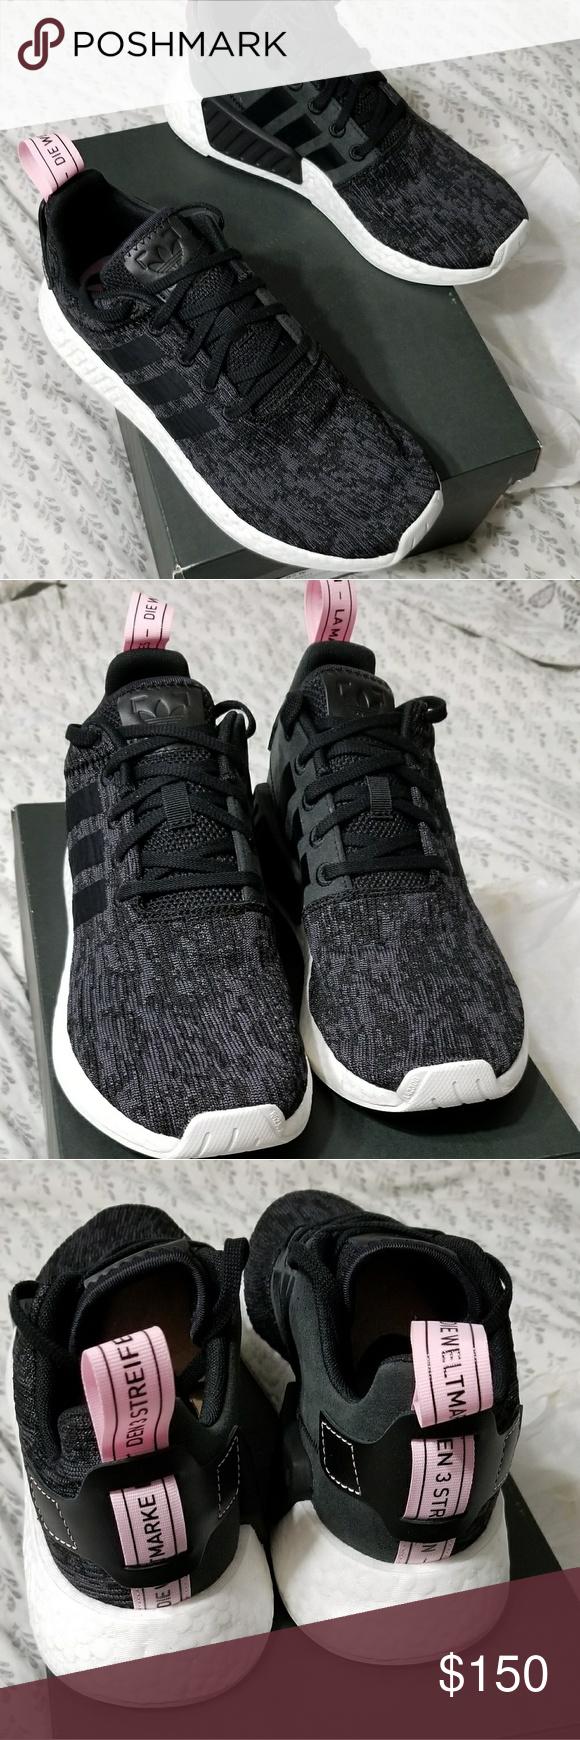 da77ee826 Adidas NMD R2 New in original box Adidas nmd r2 women s size 8. Black mesh